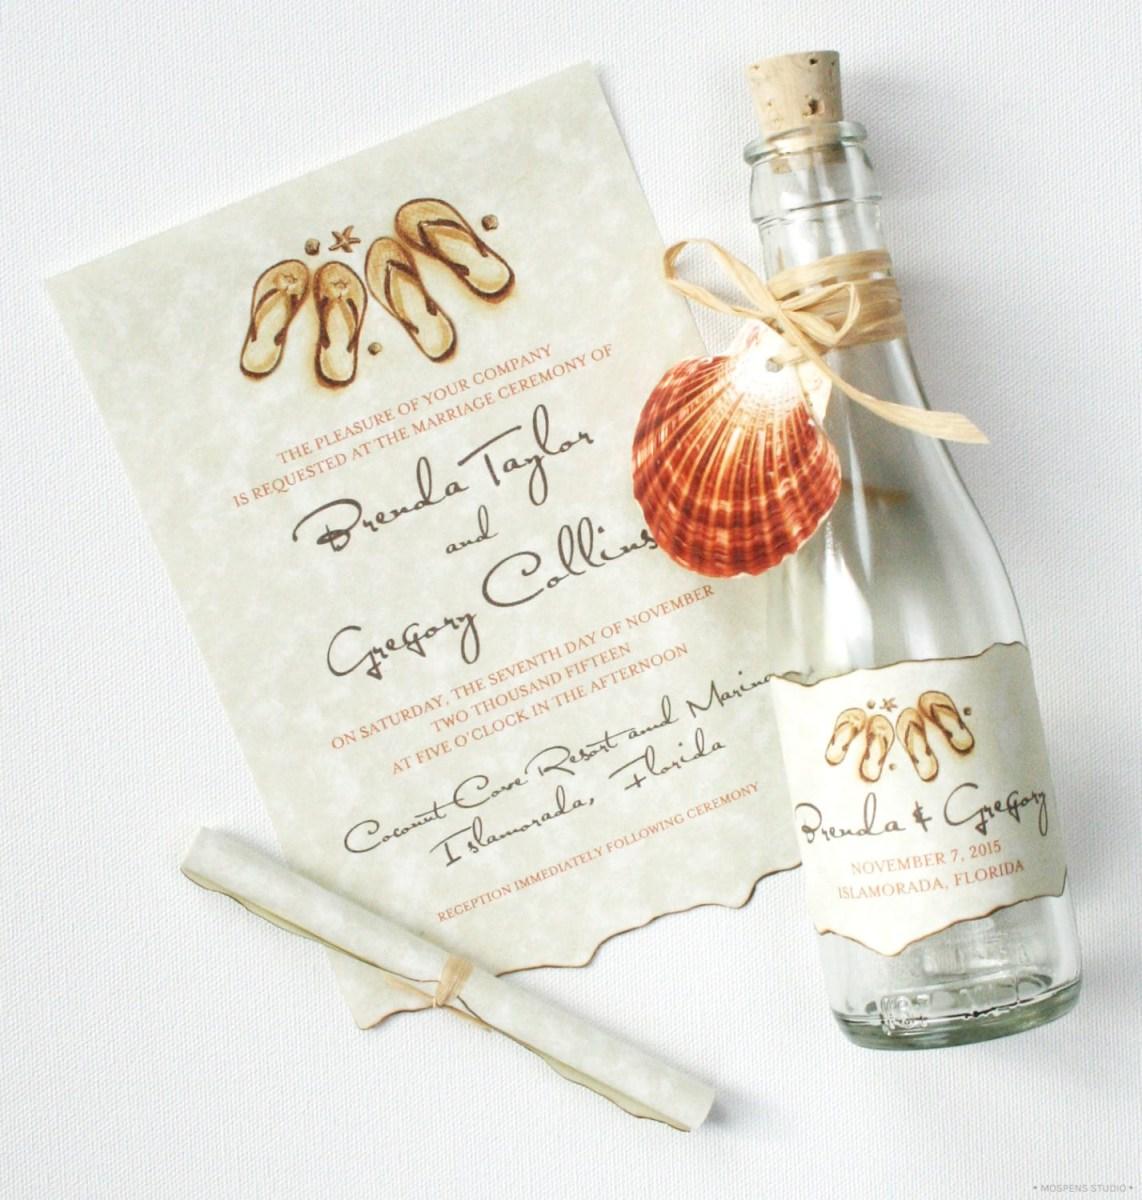 Unique Wedding Invitation Ideas 21 Bottle Beach Wedding Invitation Ideas Custom Invitations